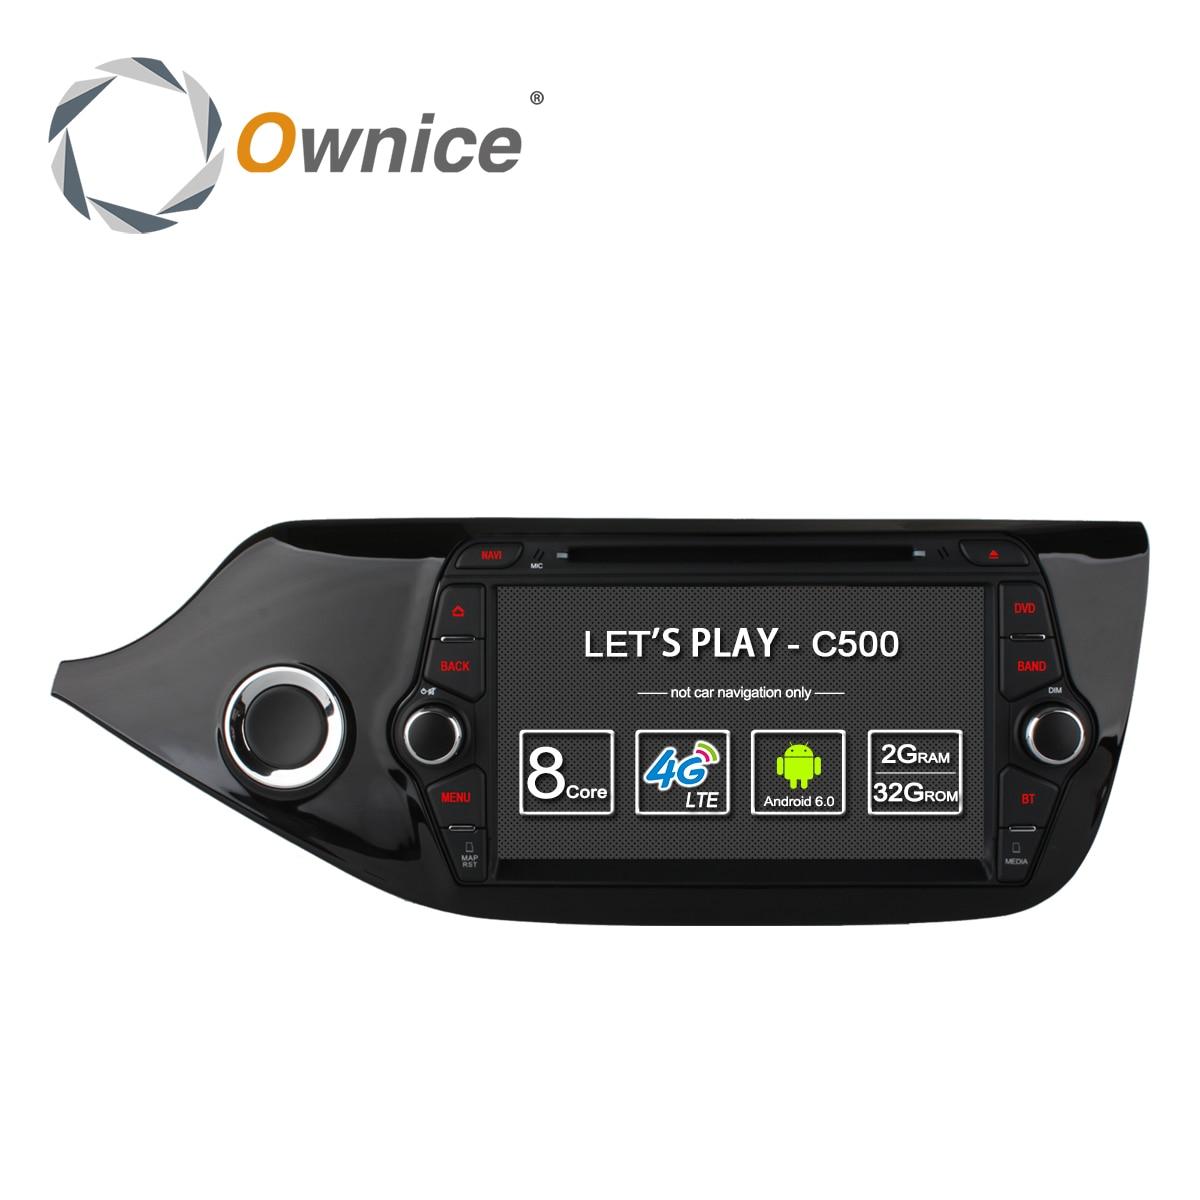 Ownice C500 4G SIM LTE Octa 8 Core  Android 6.0 For Kia CEED 2013-2015 Car DVD Player GPS Navi Radio WIFI 4G BT 2GB RAM 32G ROM автомобильный dvd плеер joyous kd 7 800 480 2 din 4 4 gps navi toyota rav4 4 4 dvd dual core rds wifi 3g